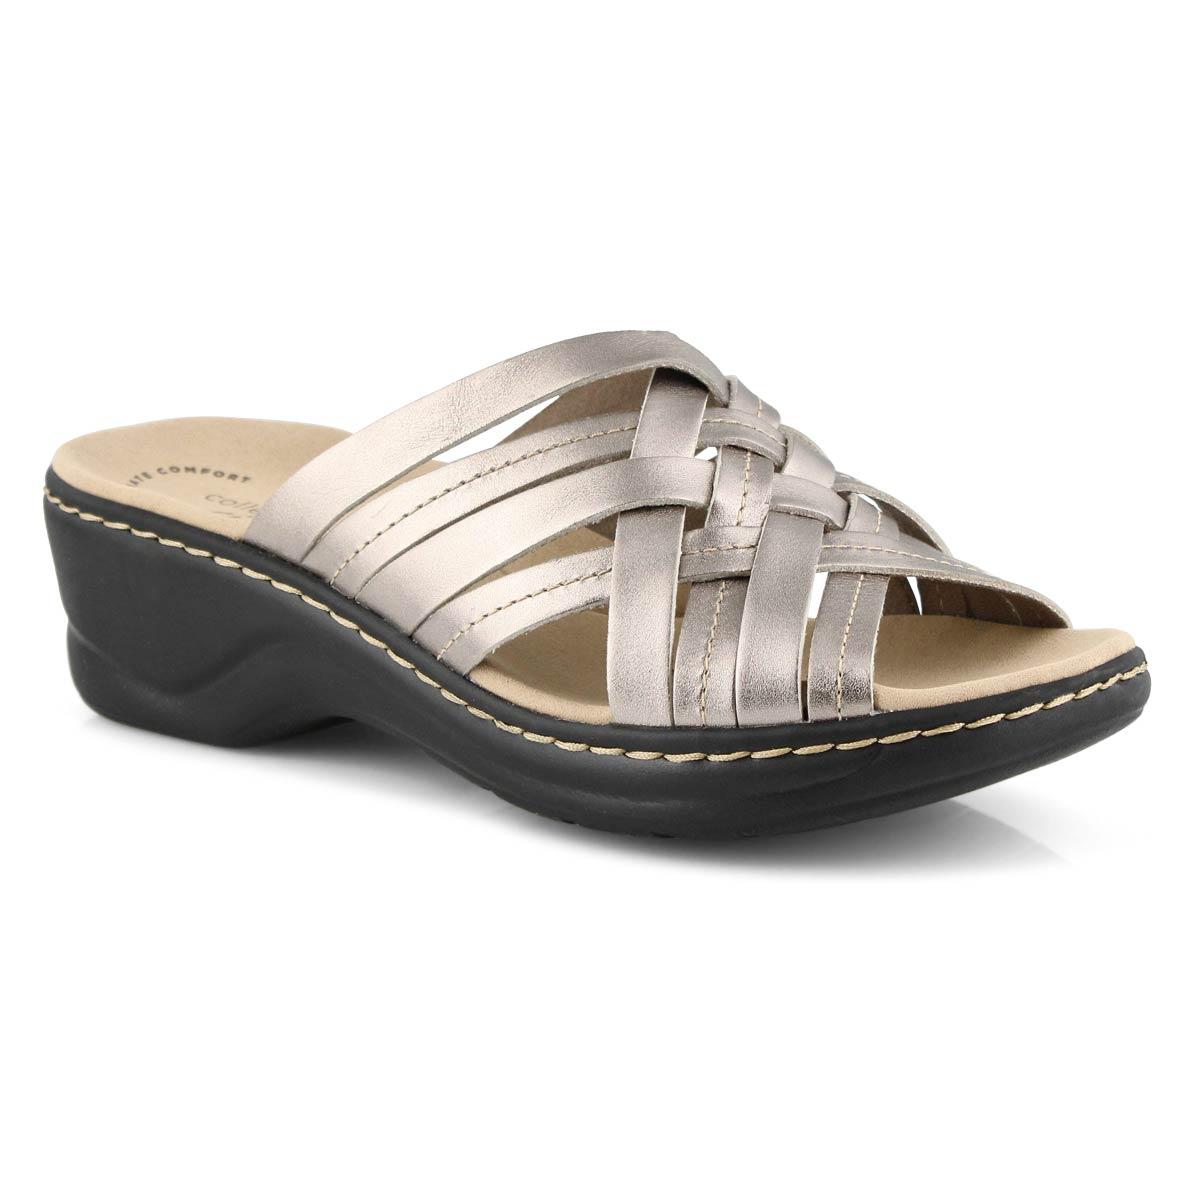 Women's Lexi Salina Wide Slide Sandal - Pewter